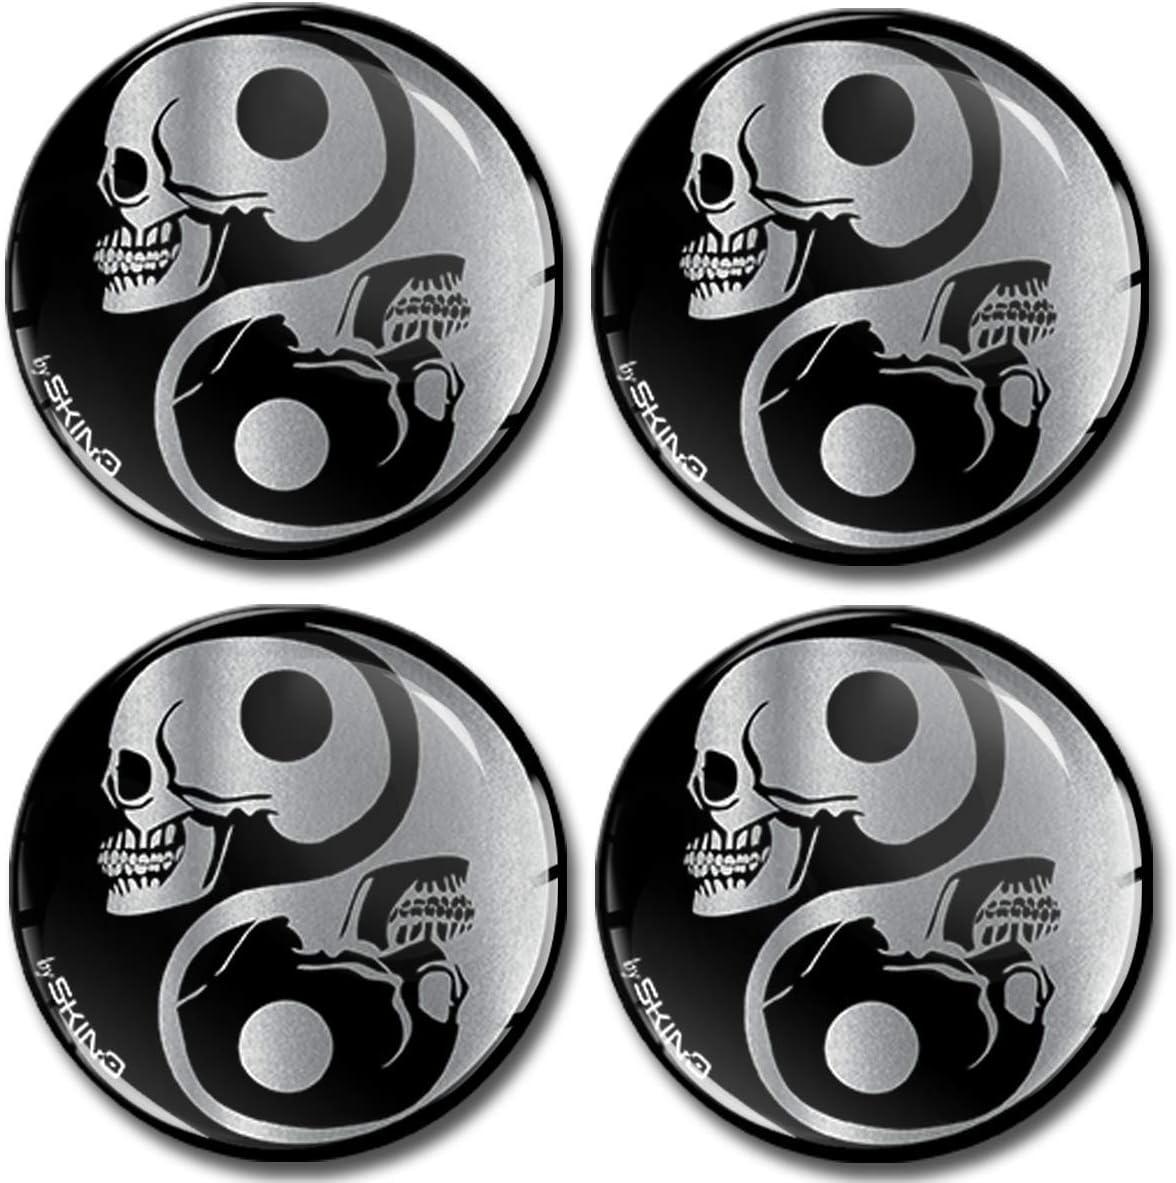 Skinoeu 4 X 60mm Aufkleber 3d Gel Silikon Stickers Symbol Yin Yang Silber Skulls Schädel Totenkopf Felgenaufkleber Für Radkappen Nabenkappen Radnabendeckel Nabendeckel Auto Tuning A 8260 Auto